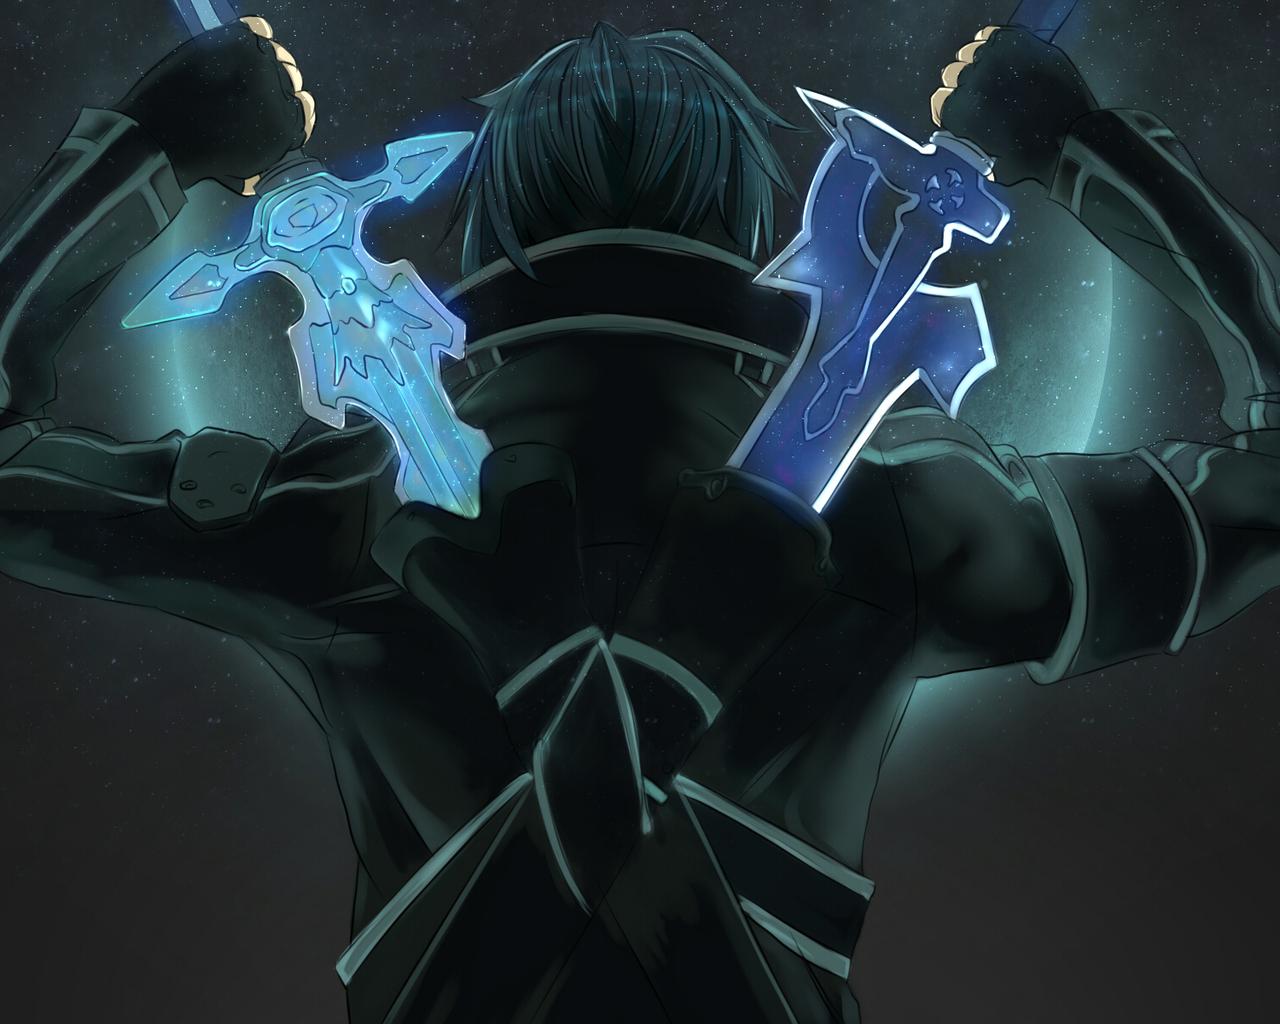 Image Result For Download Wallpaper Anime Sword Art Online Hd